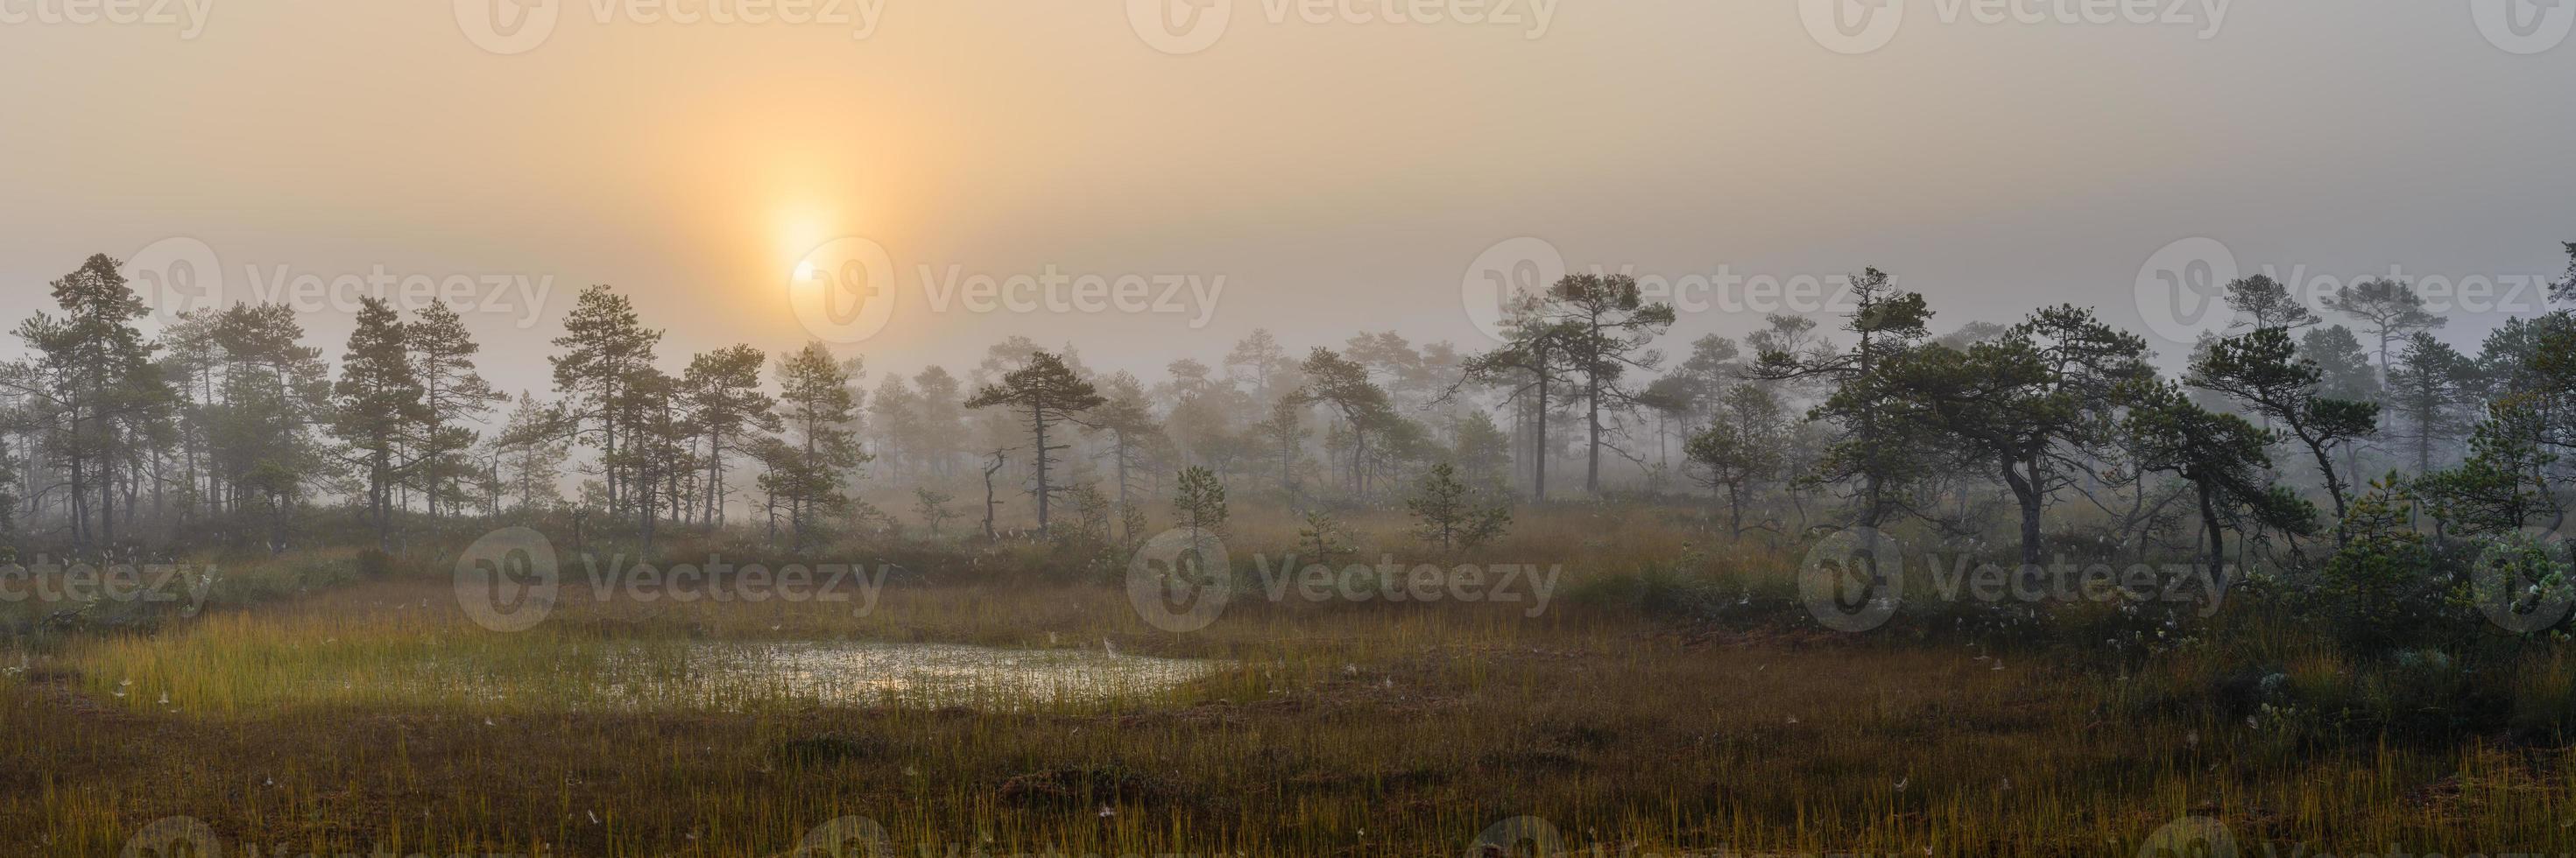 am frühen Morgen im Moor foto